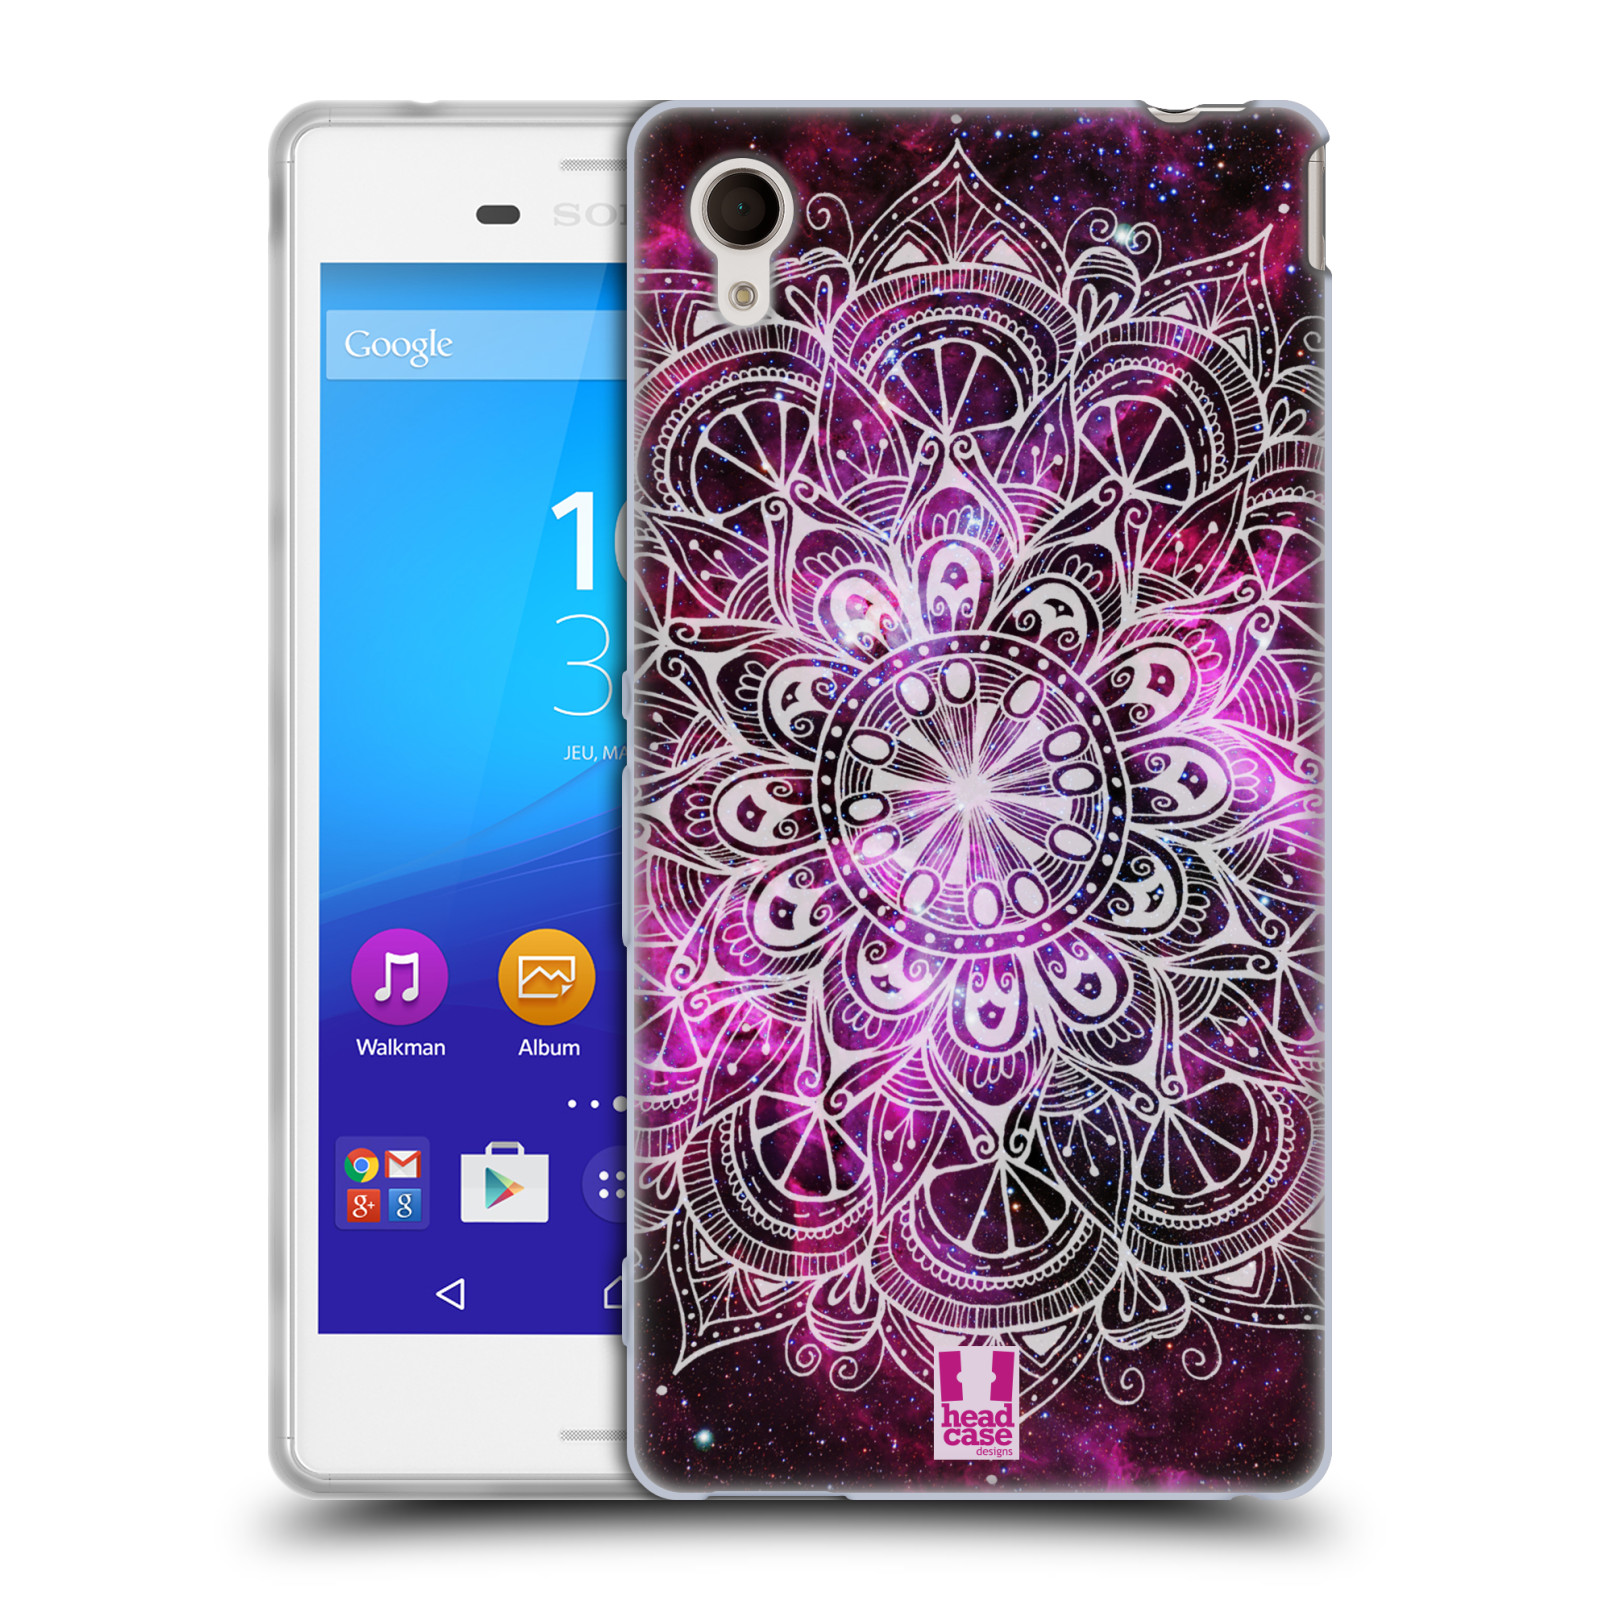 Silikonové pouzdro na mobil Sony Xperia M4 Aqua E2303 HEAD CASE Mandala Doodle Nebula (Silikonový kryt či obal na mobilní telefon Sony Xperia M4 Aqua a M4 Aqua Dual SIM)